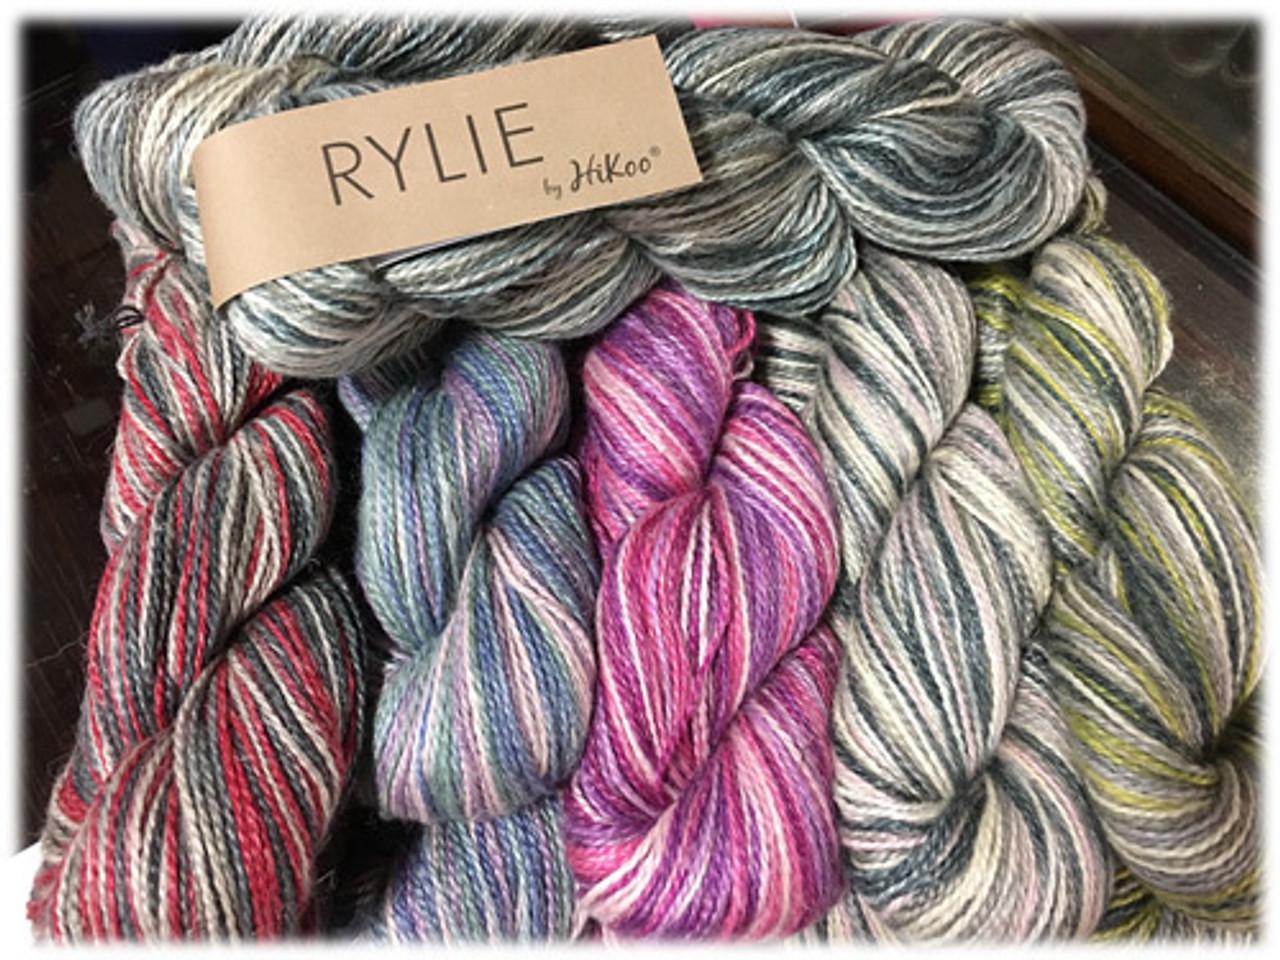 HiKoo Yarns - Rylie Hand Painted